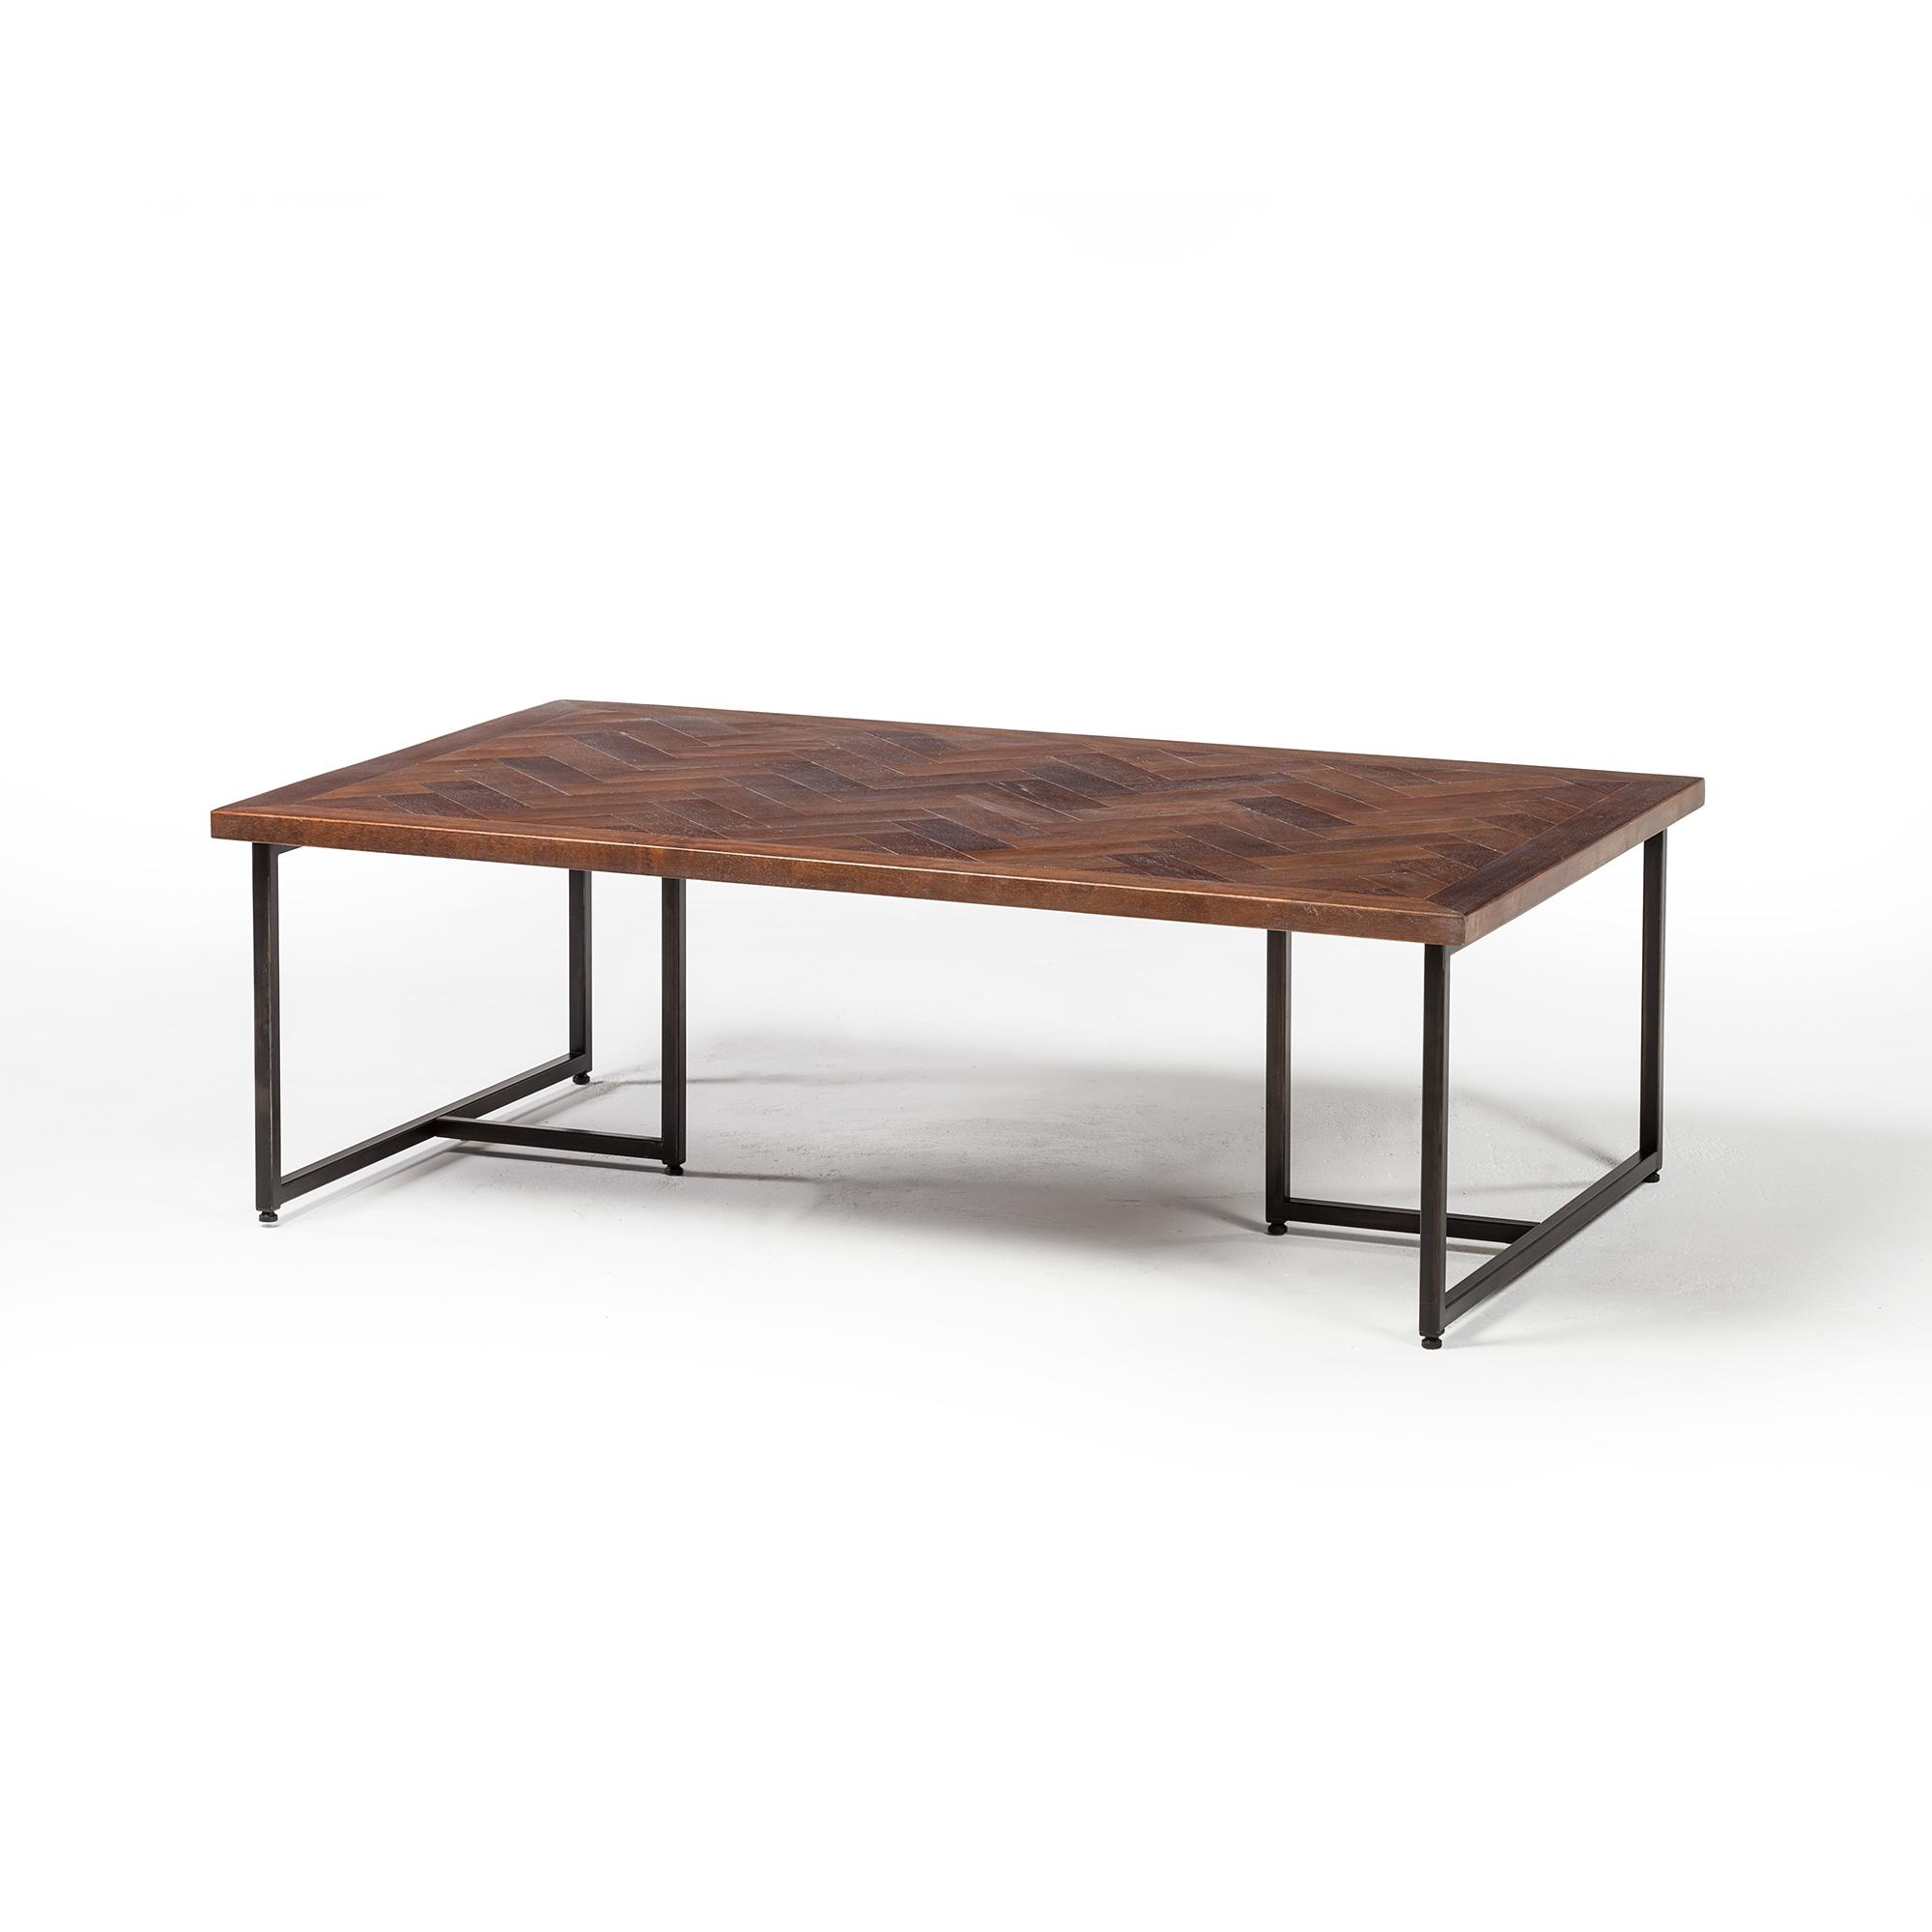 Herringbone Inlay Coffee Table The Khazana Home Furnishings